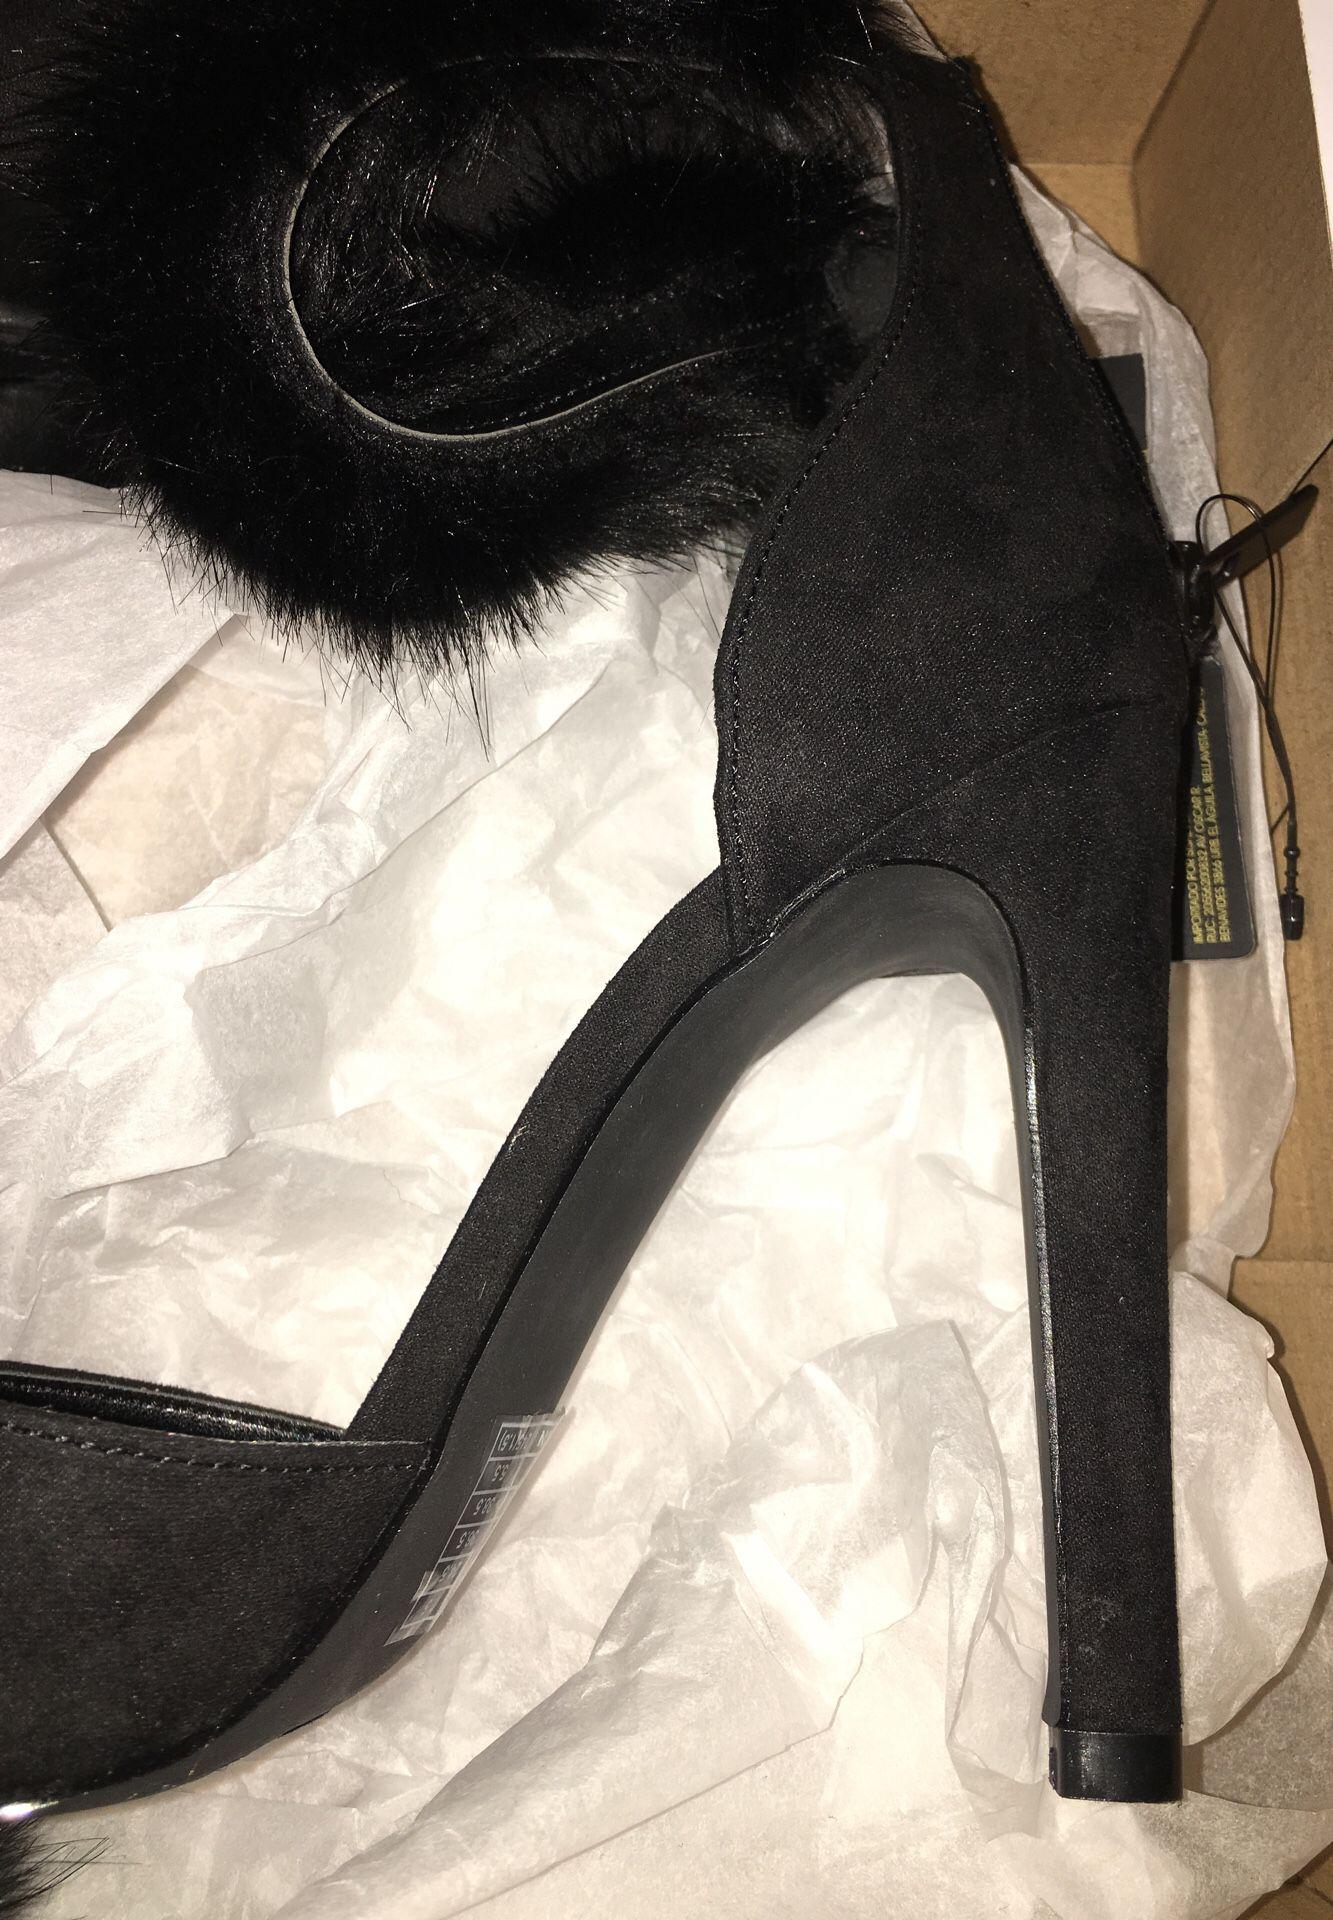 New high heels (brand new)